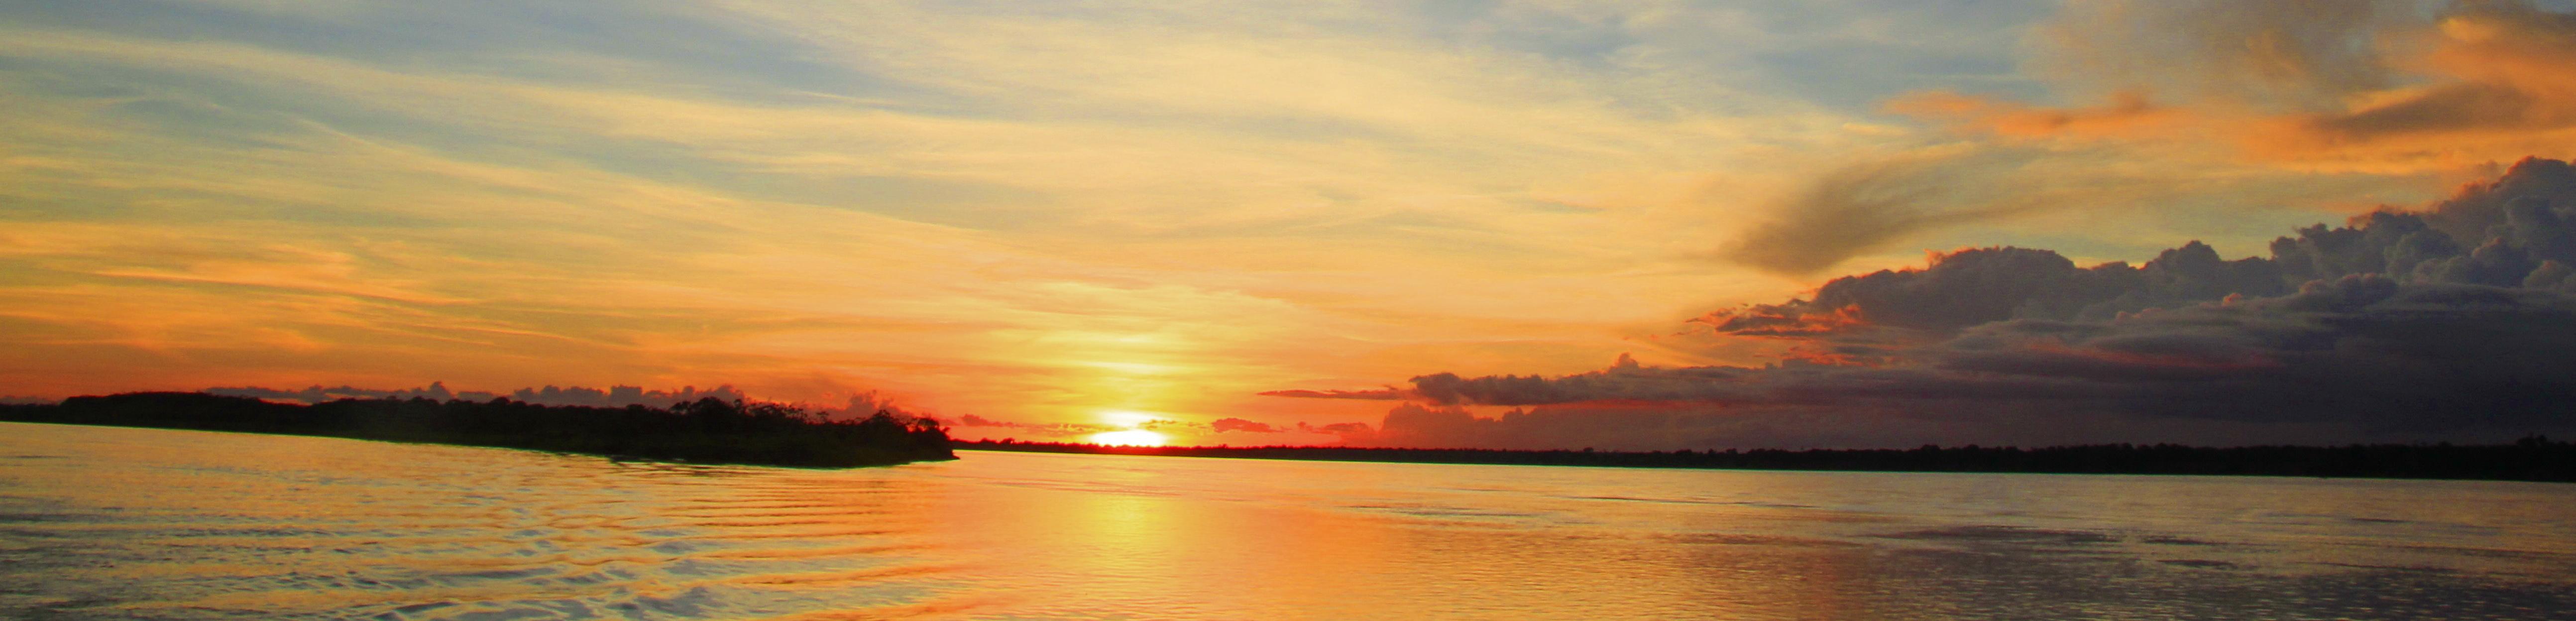 Amazonas Brasilien Sonnenuntergang auf dem Amazonas